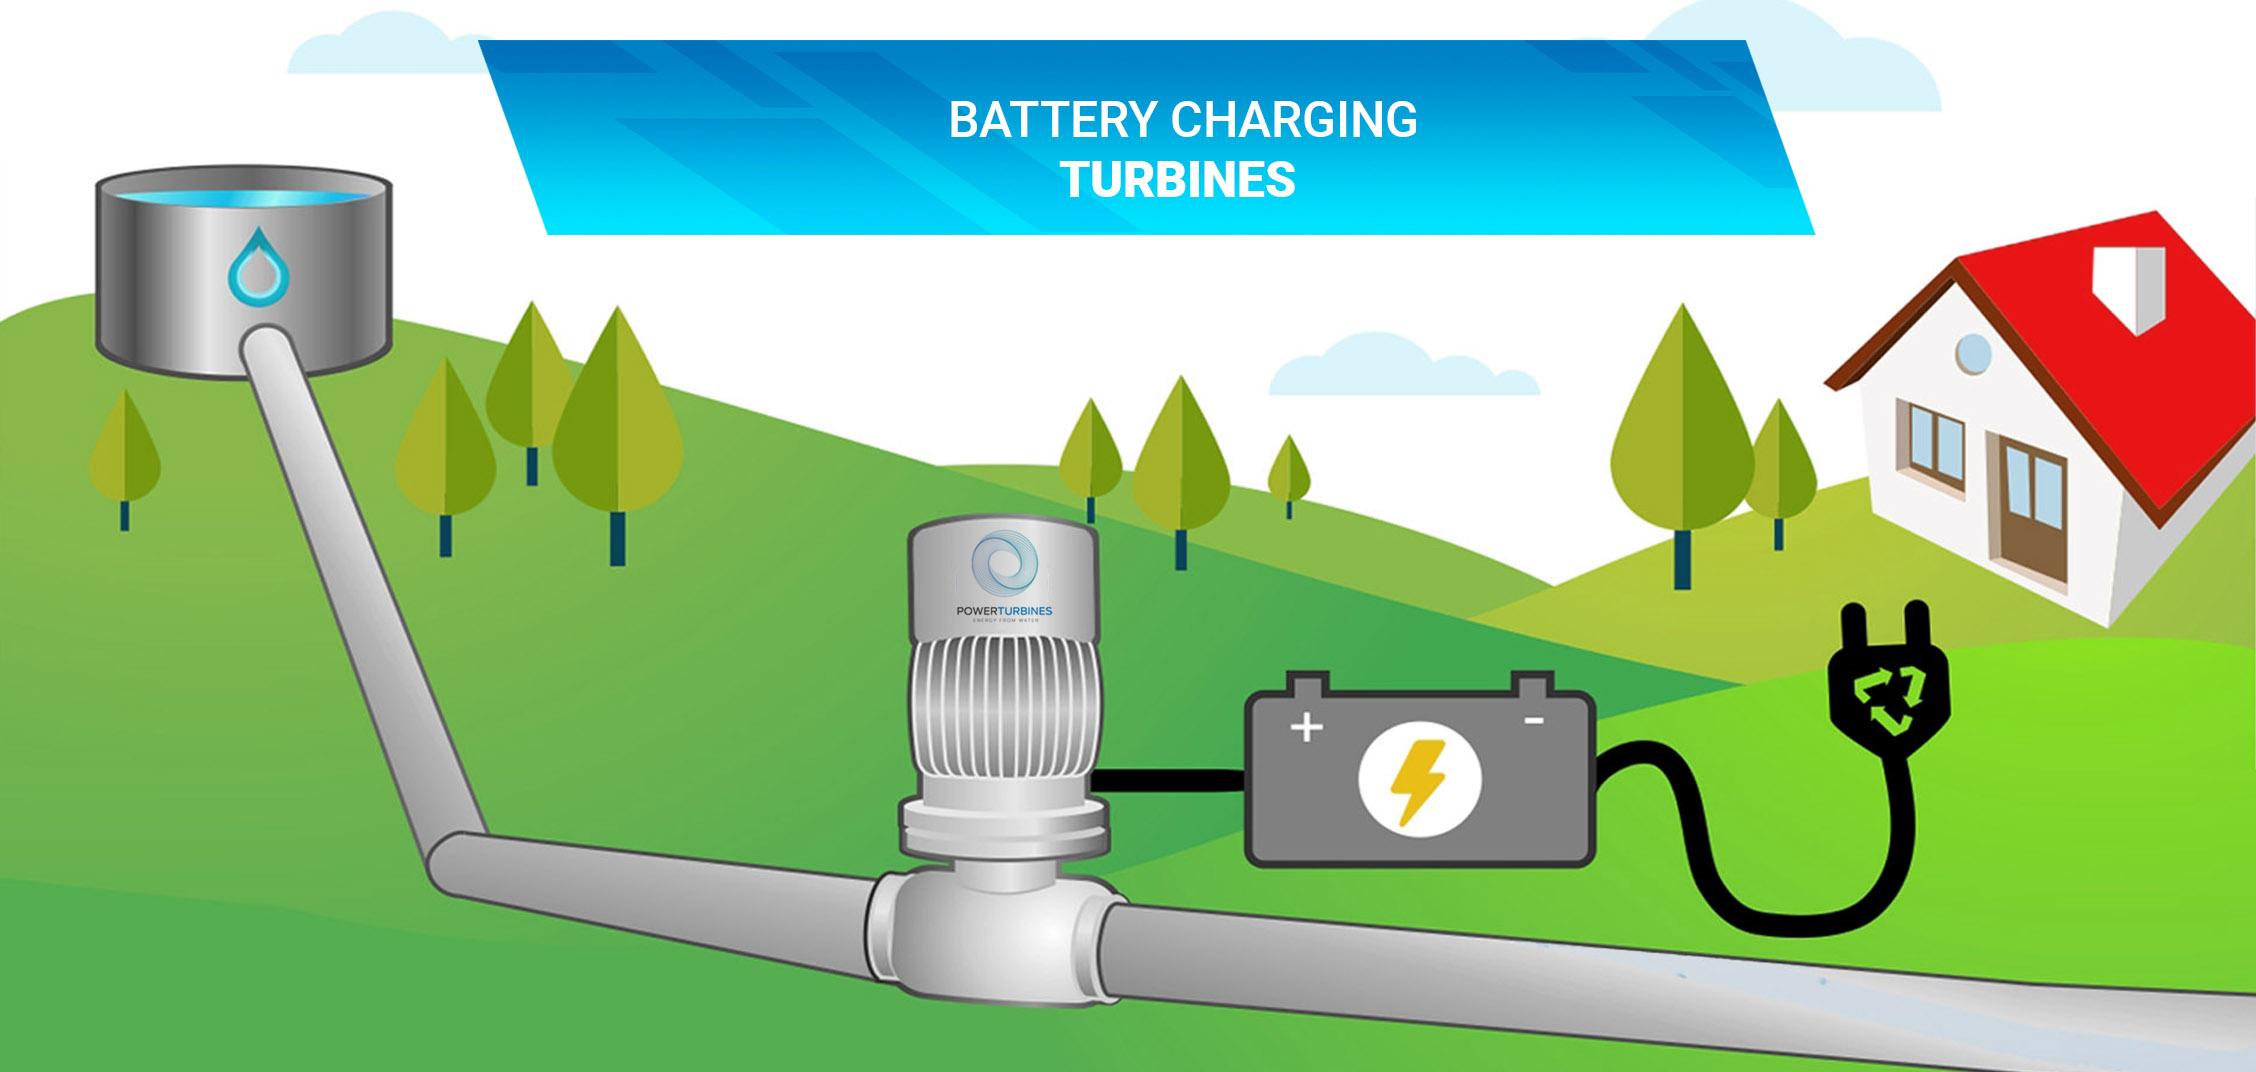 BAttery charging turbines